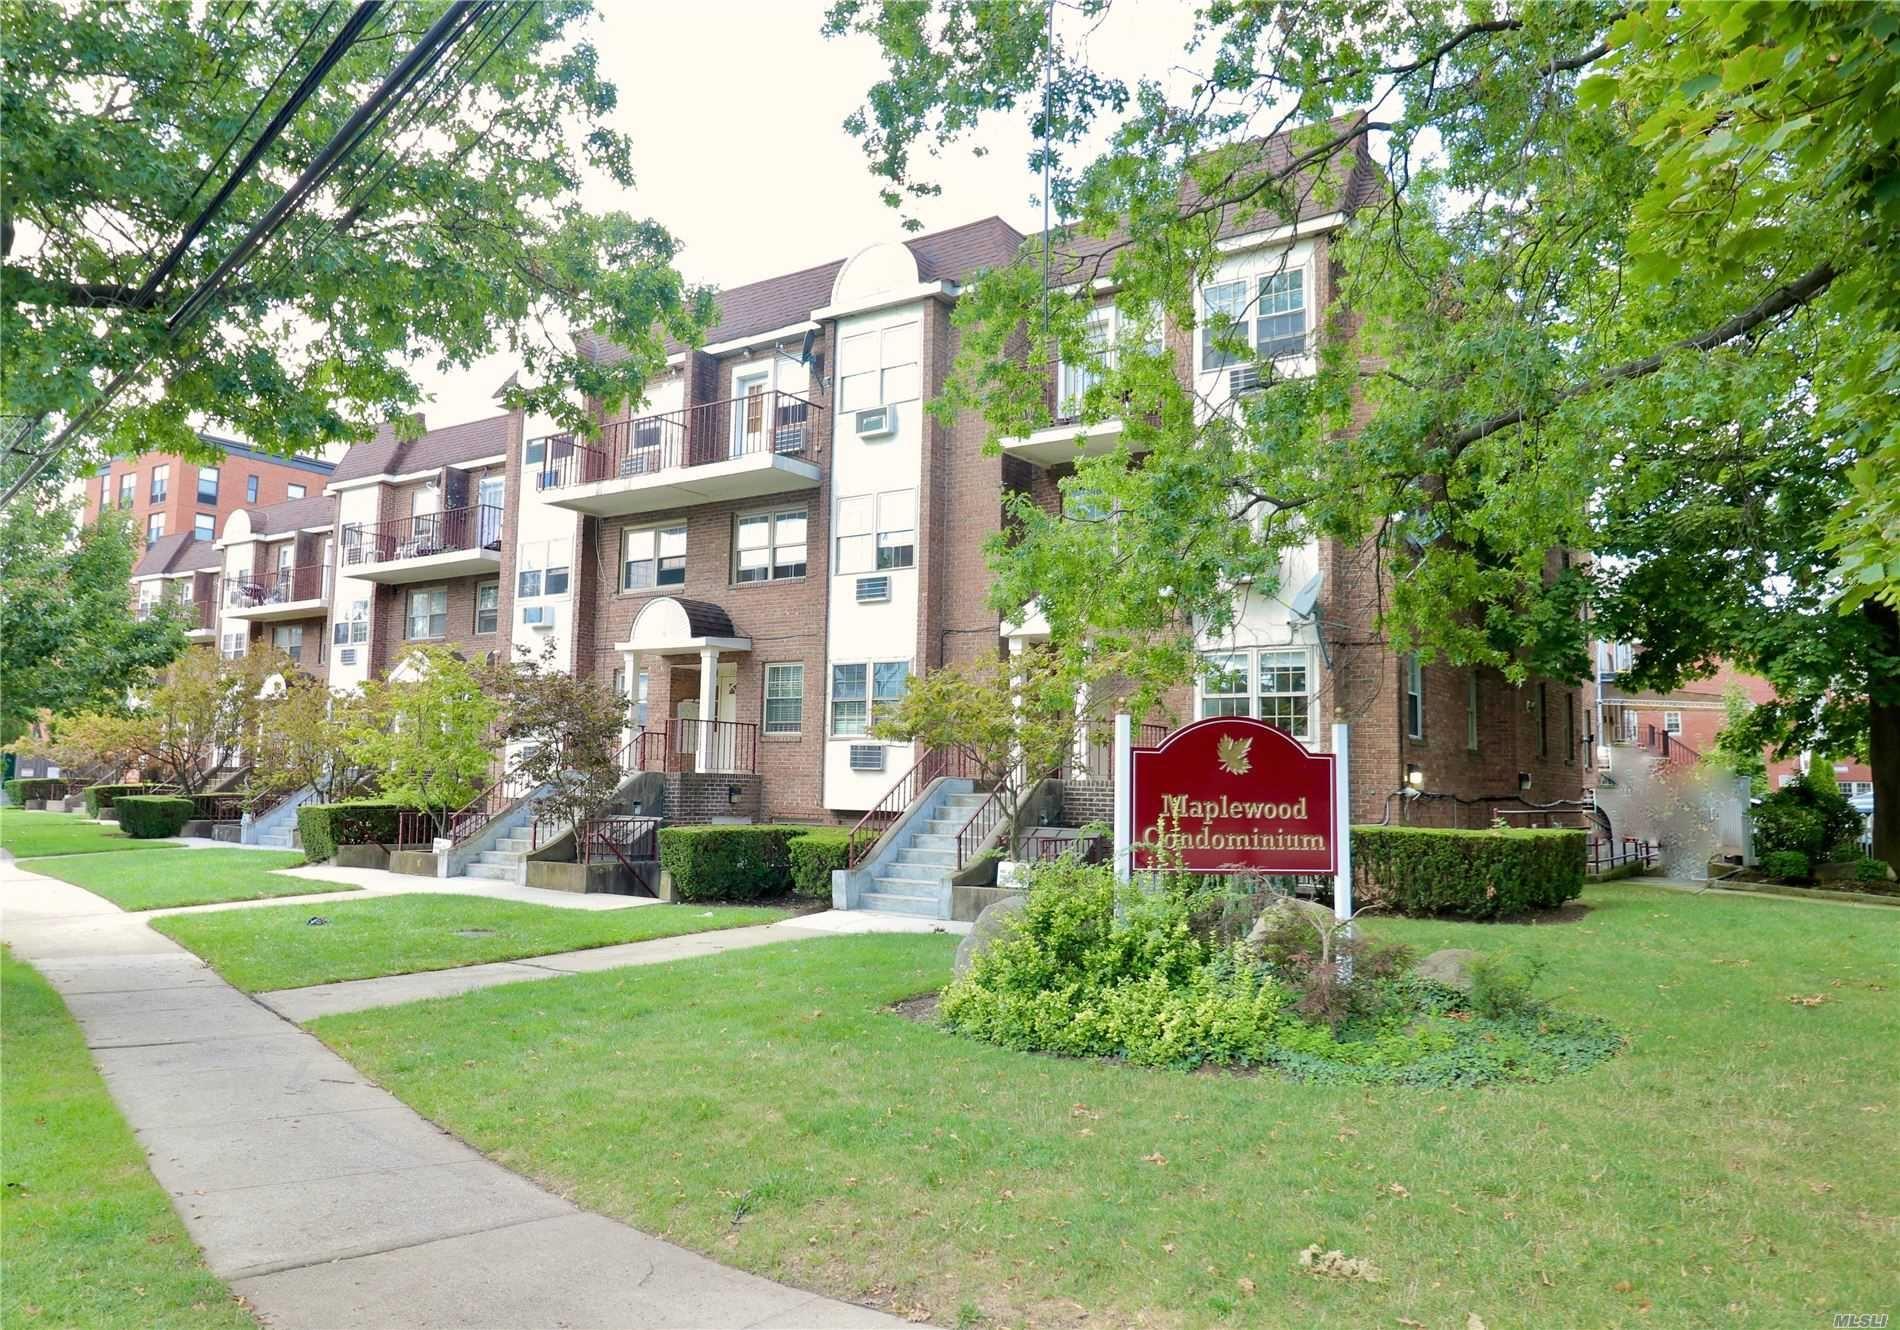 172-35 Highland Avenue #3A, Jamaica Estates, NY 11432 - MLS#: 3245015